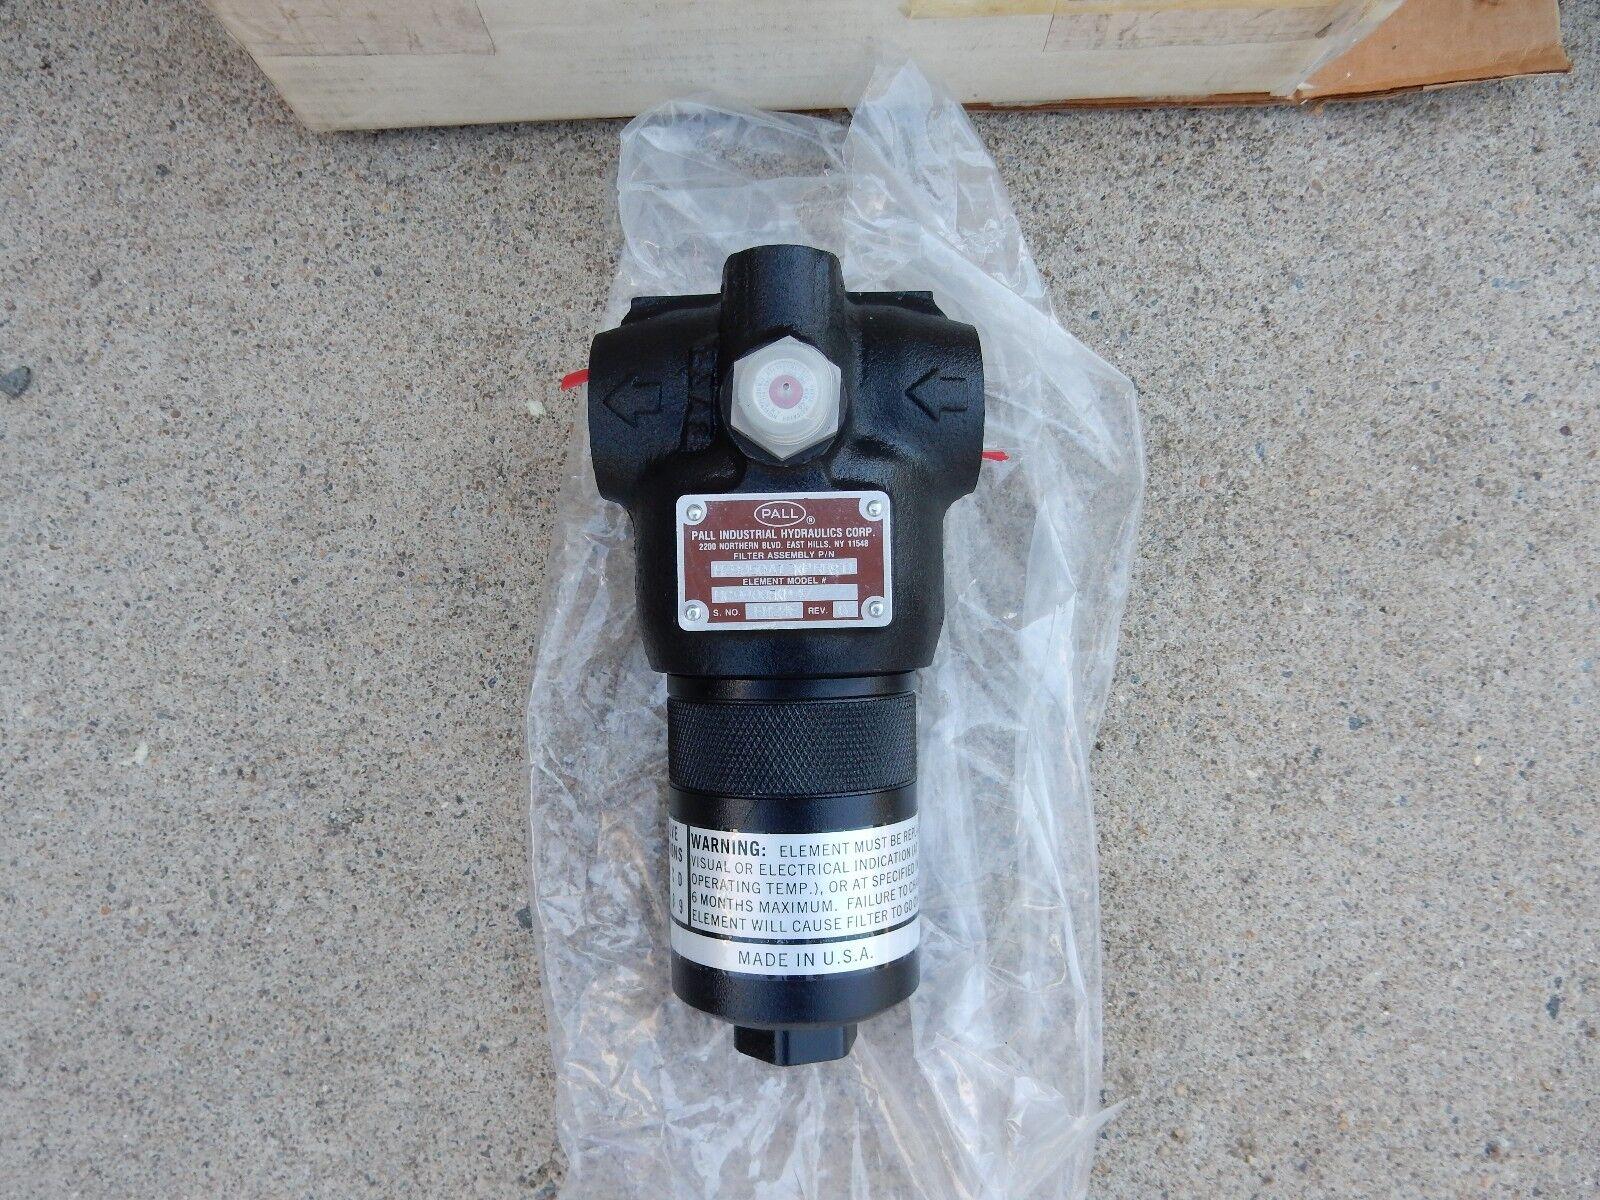 Pall Industrial Hydraulics Corp Hydraulic Fluid Filter